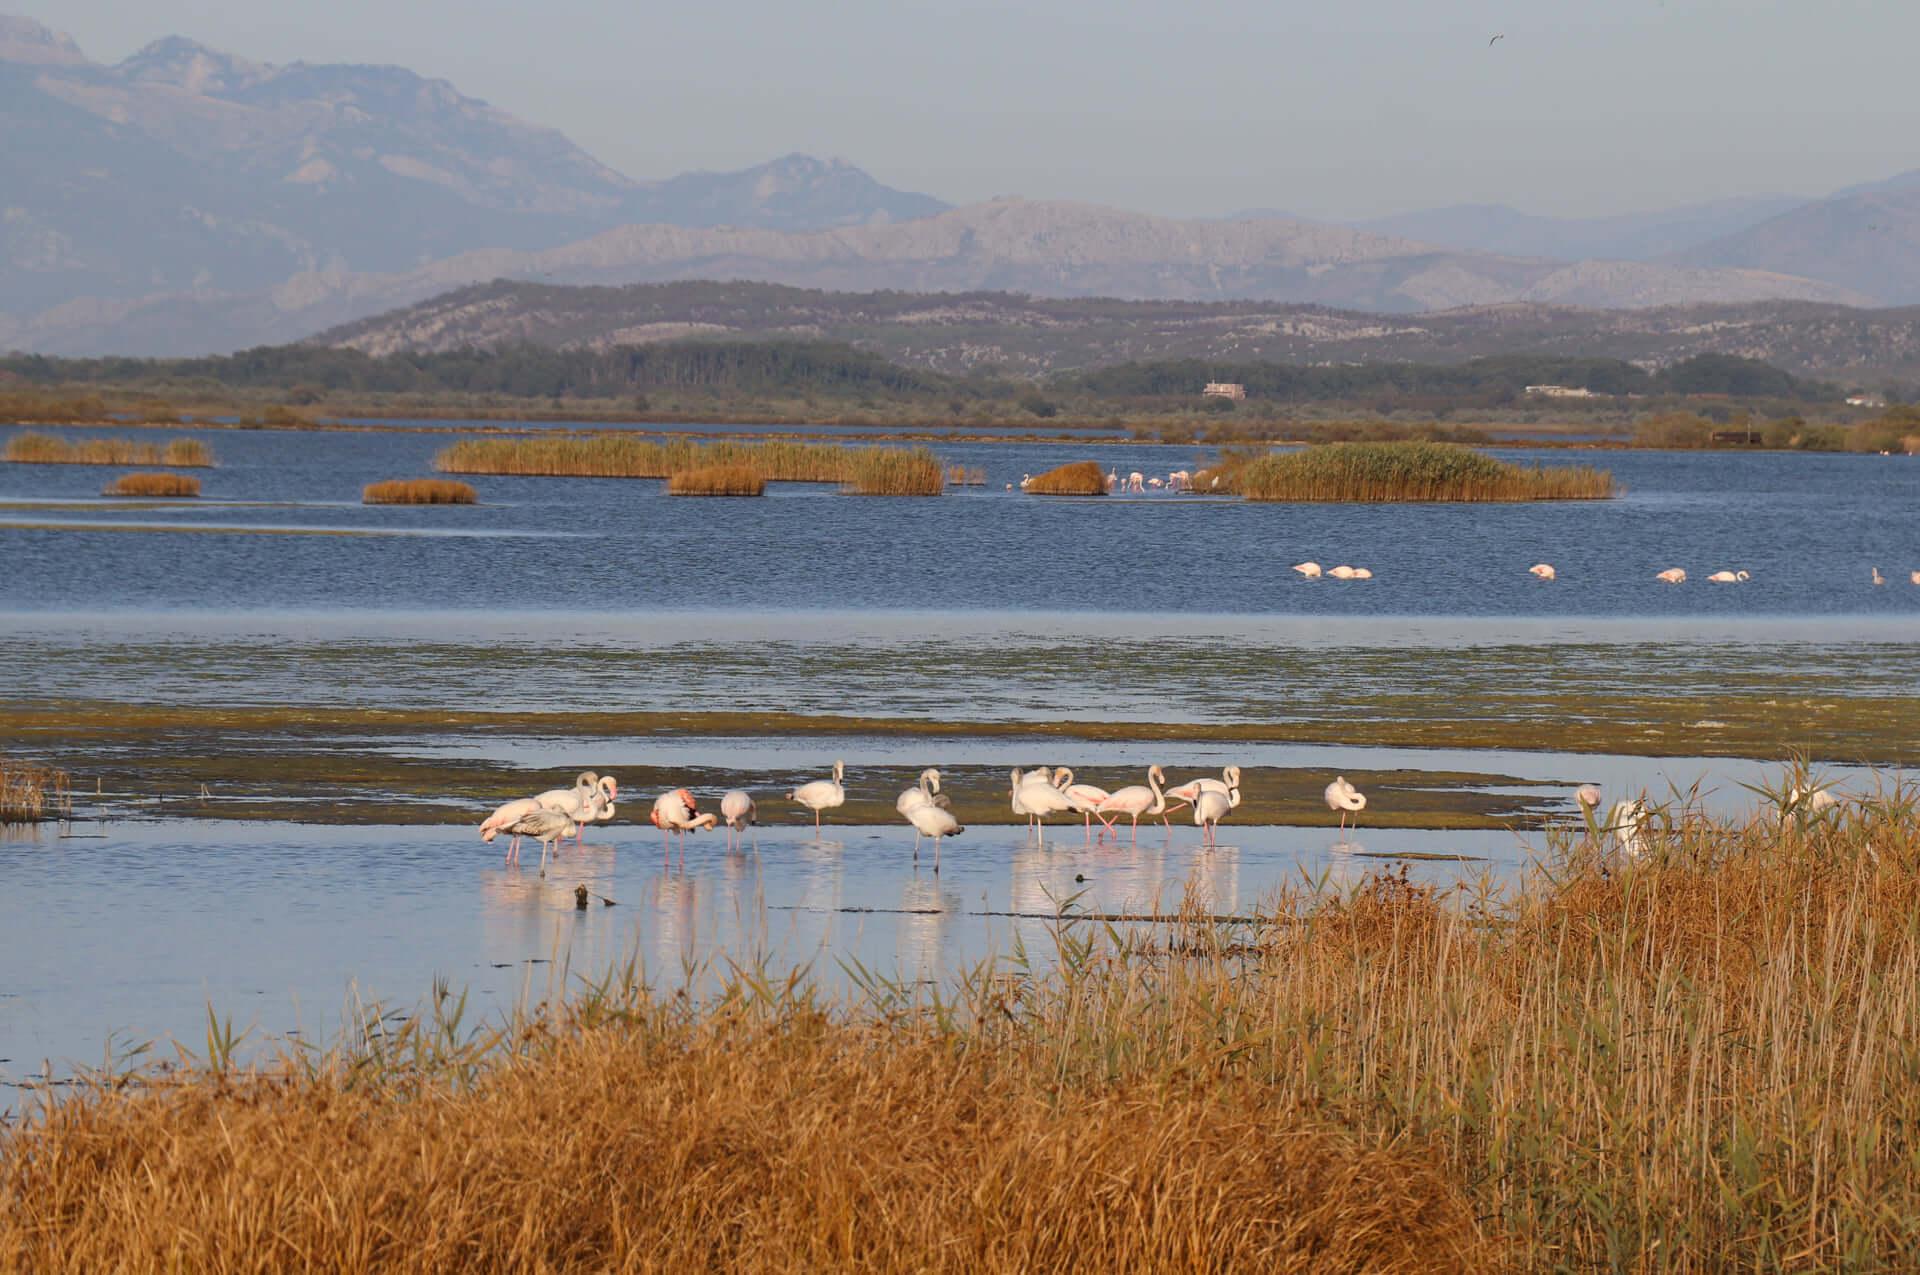 Ulcinj Salina has been associated with birds since its inception